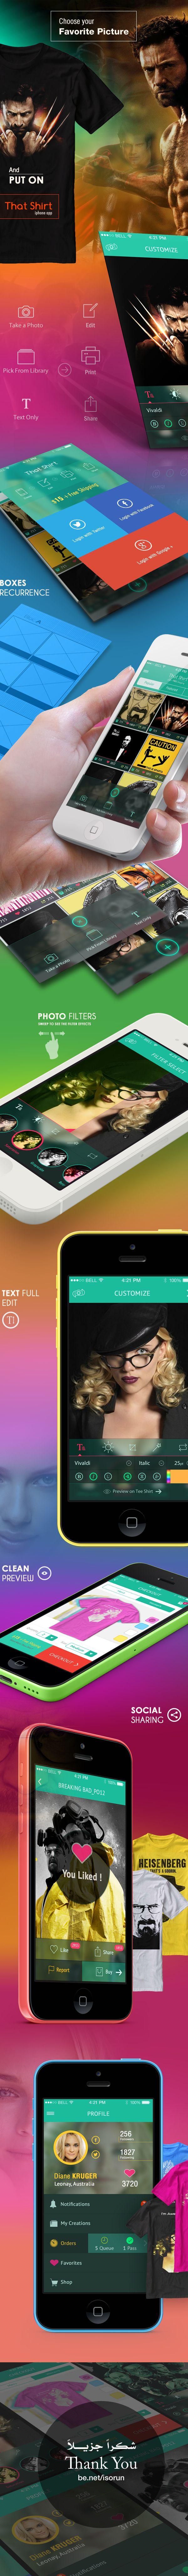 Shirt design app for iphone - Tee Shirt App Ios 7 By Yasser Achachi Via Behance